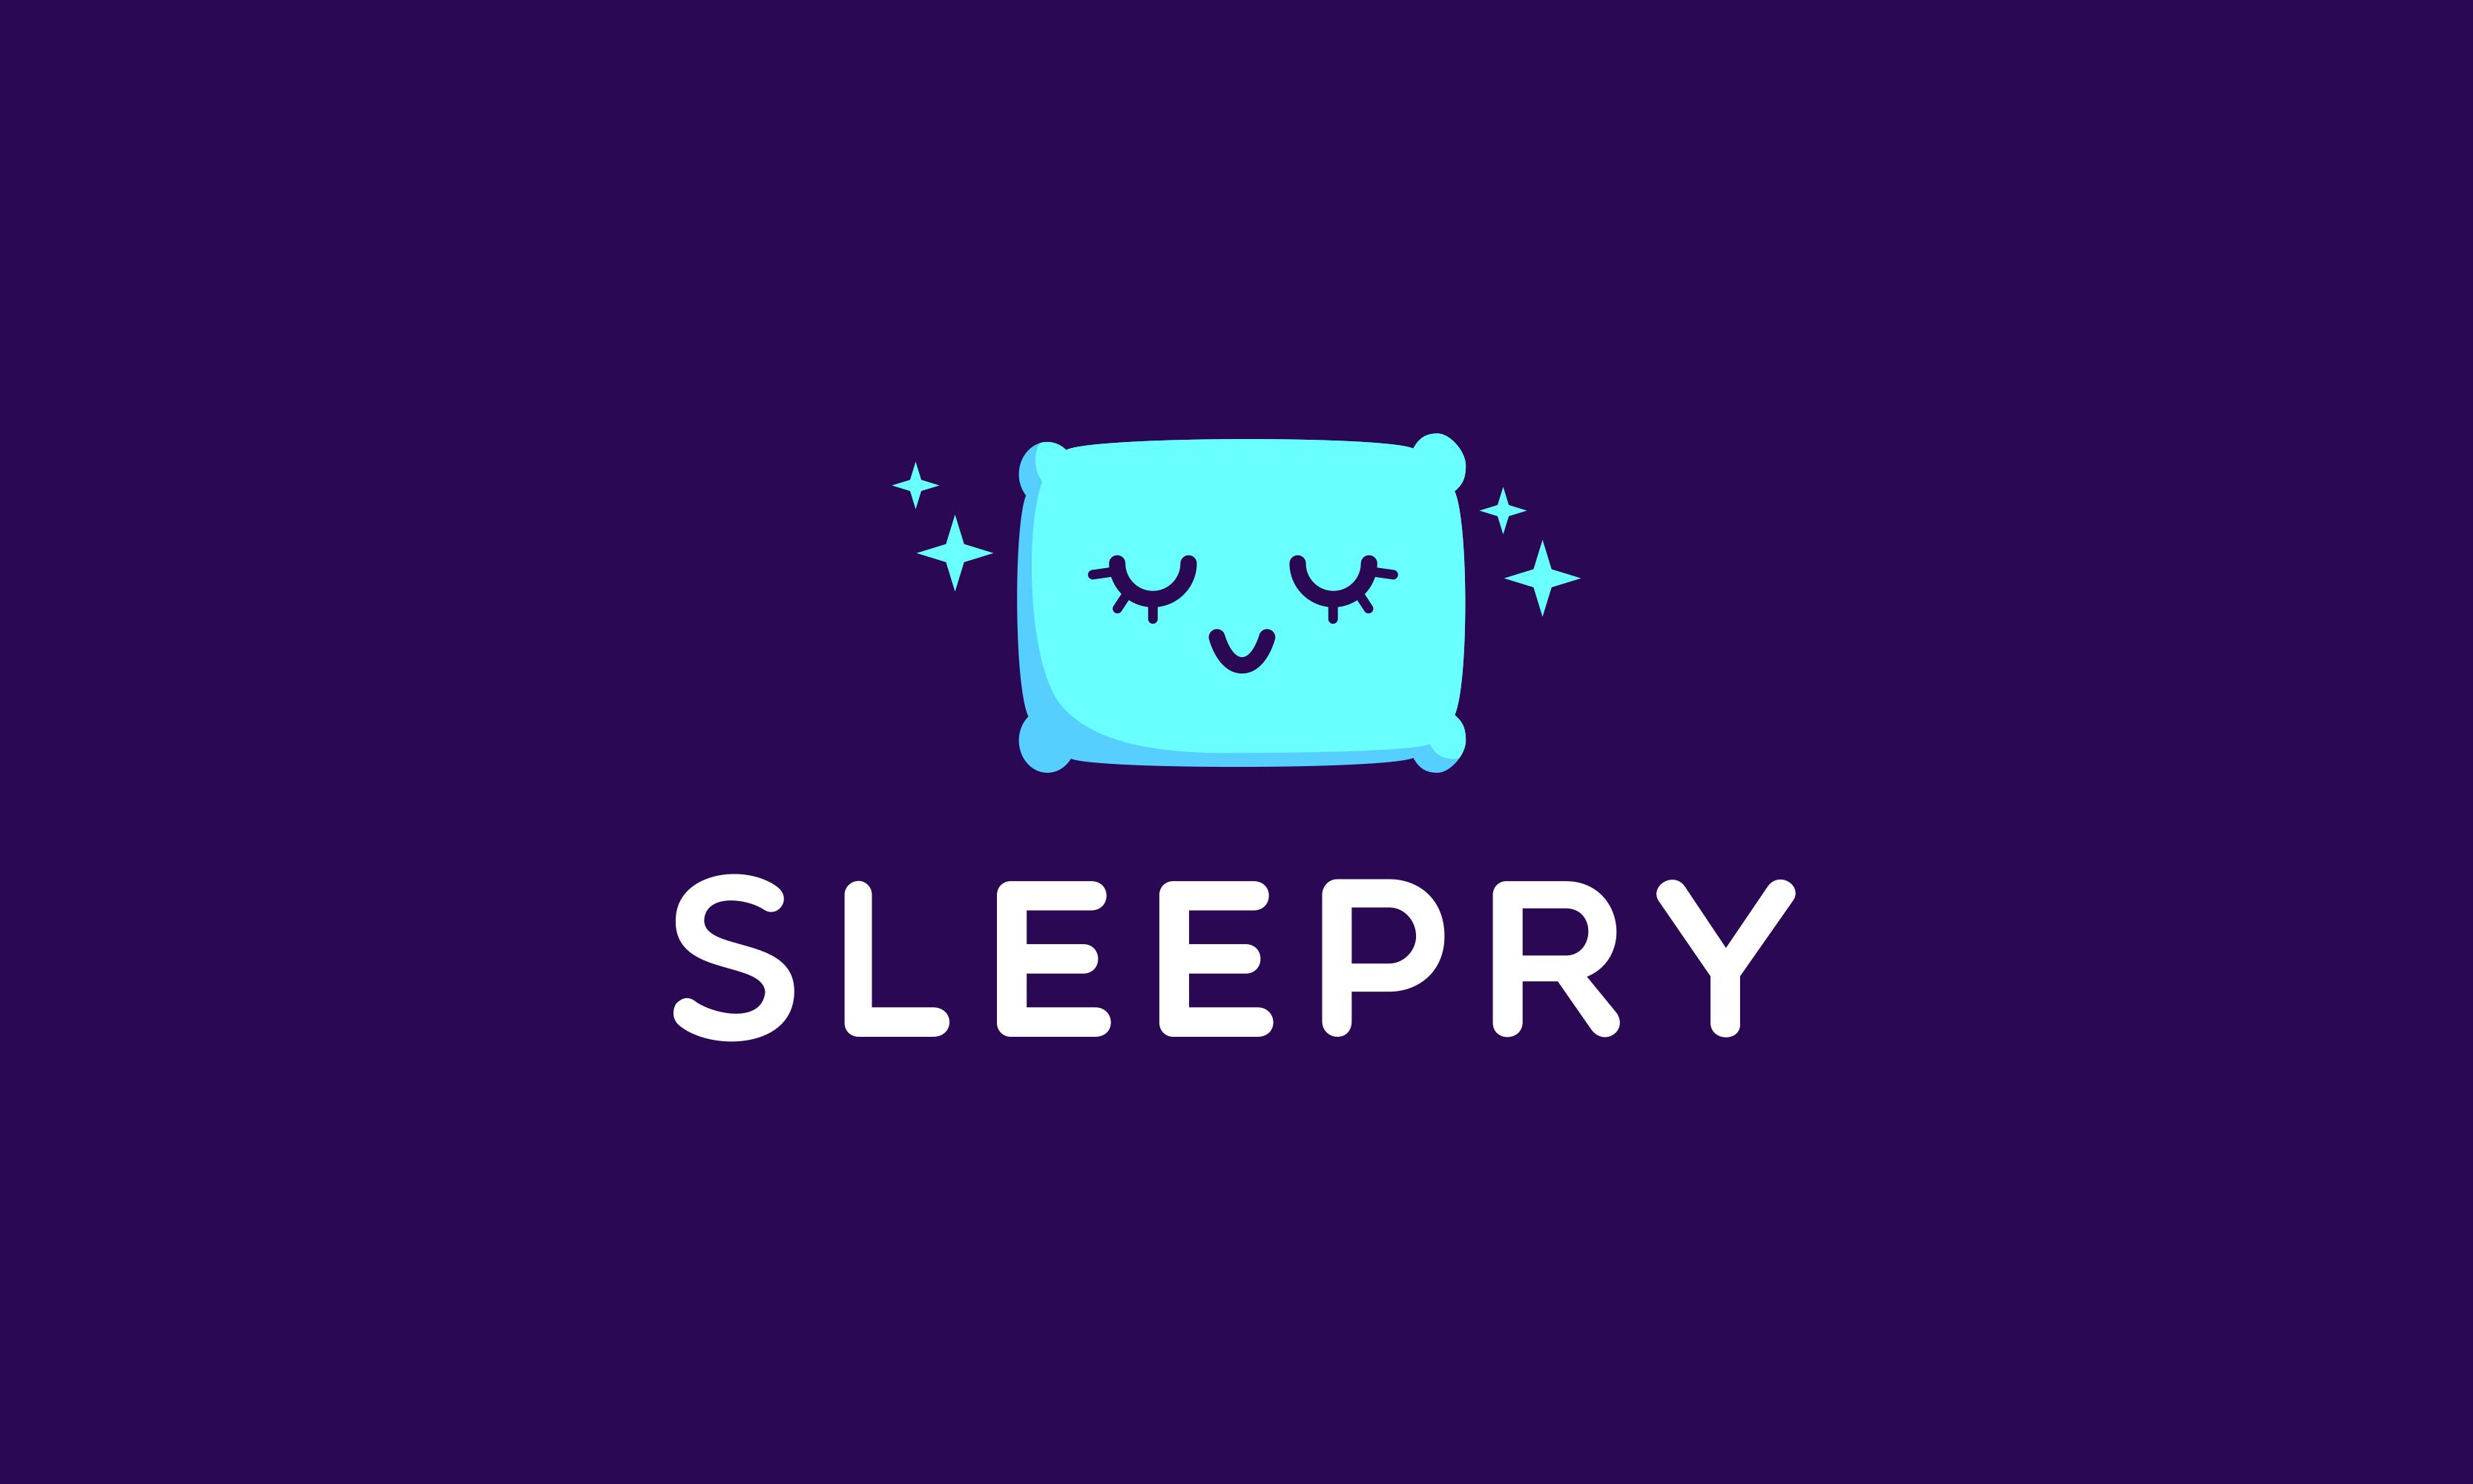 Sleepry - Wellness domain name for sale